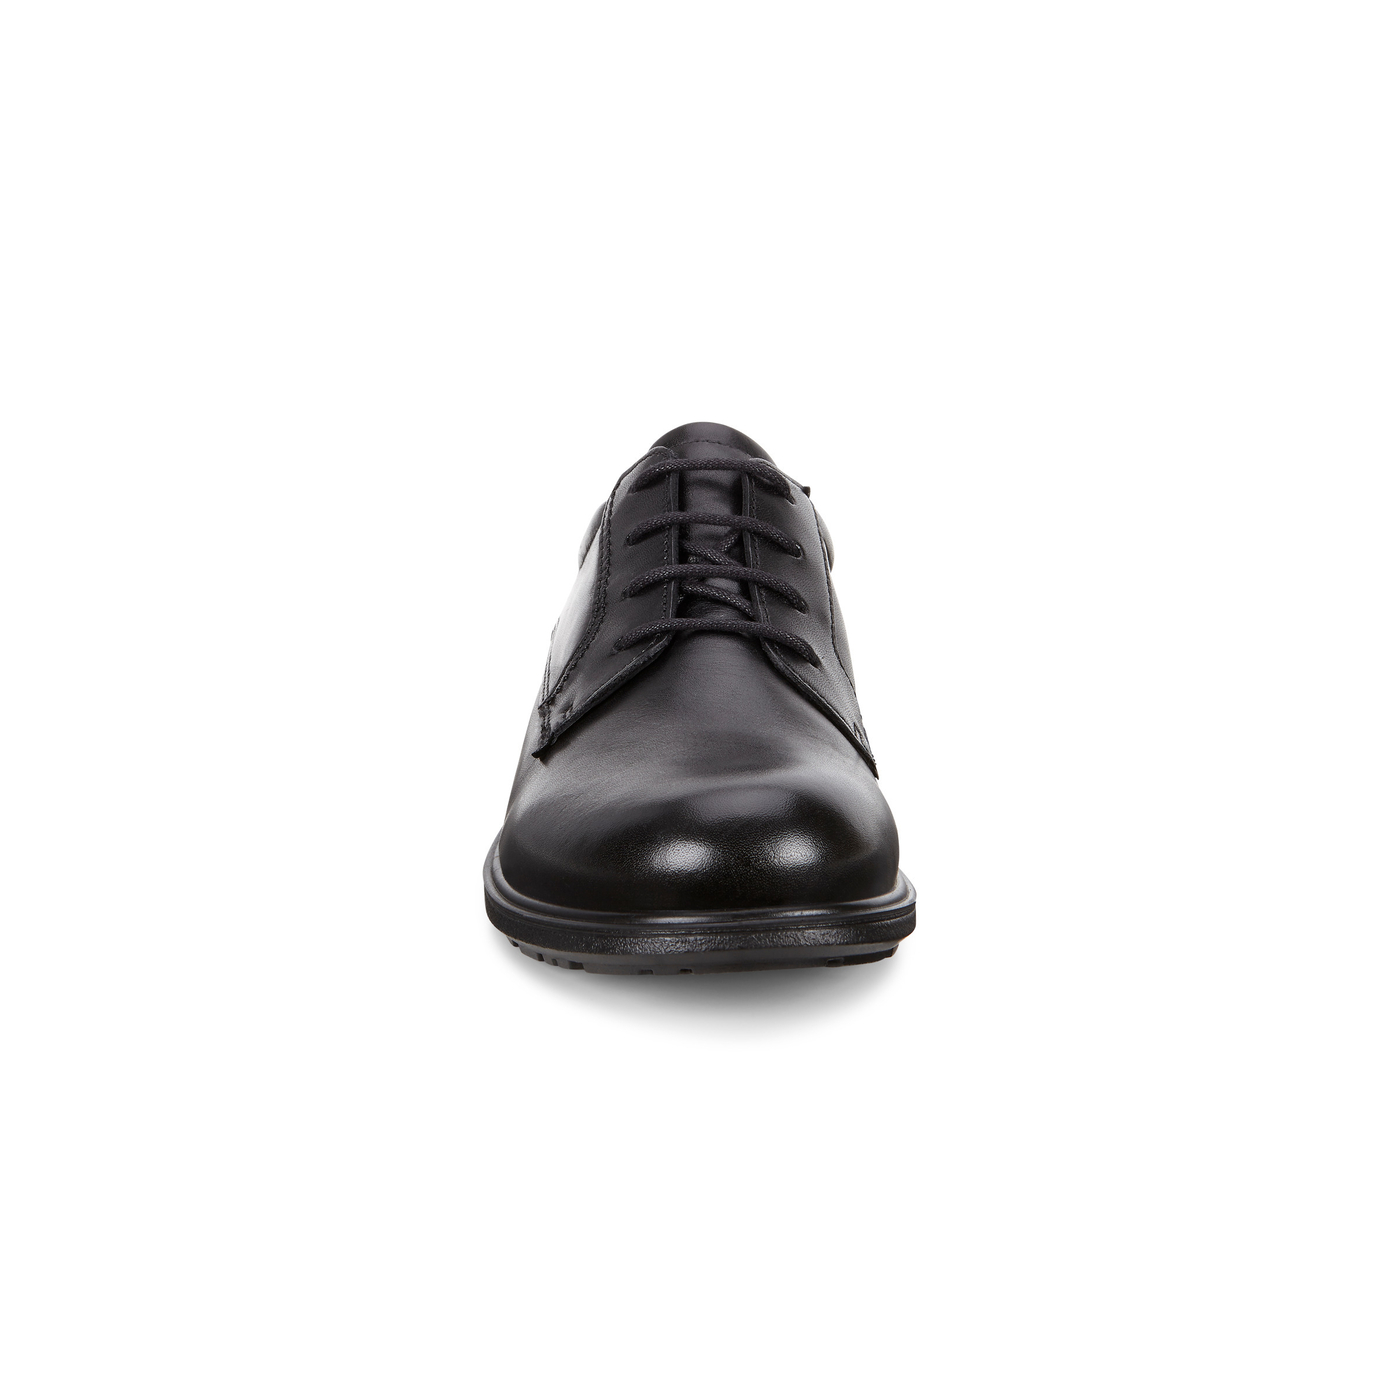 e6f04106 ECCO Cohen Boys' School Shoe | Kids' Shoes | ECCO® Shoes